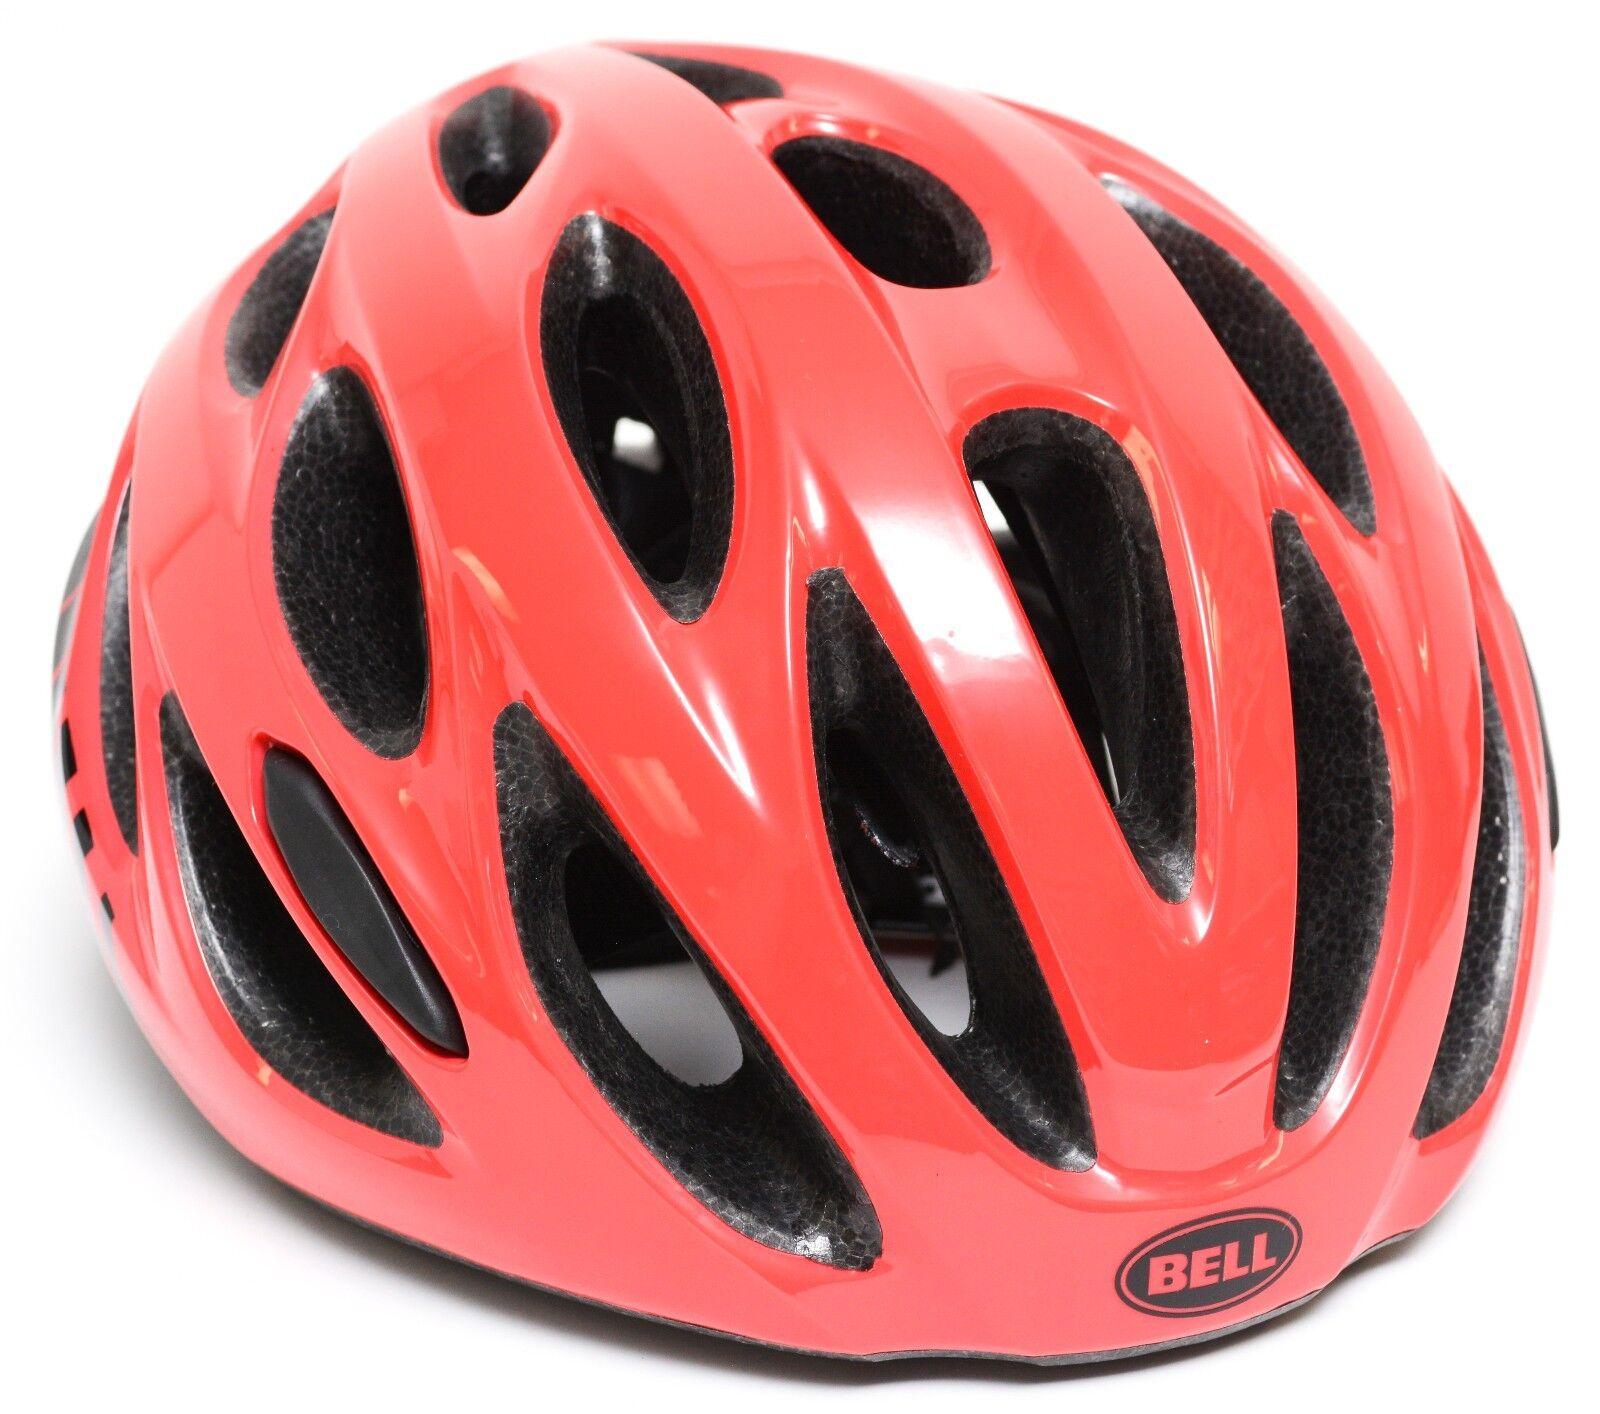 Bell Draft Cycling Bike Helmet Men Universal Fit 54-61cm Red